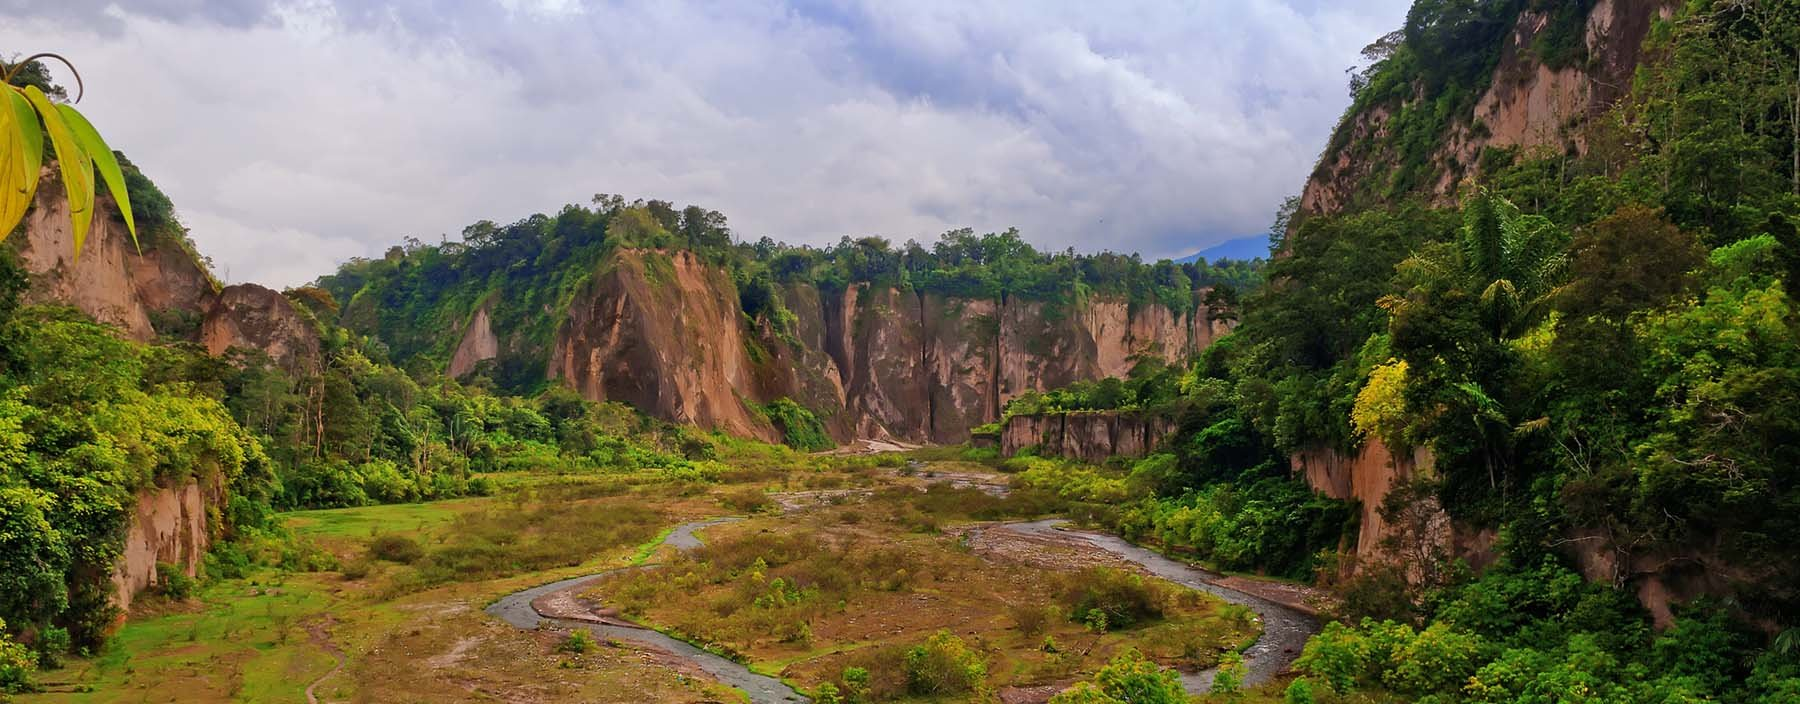 id, sumatra, bukittinggi, sianok canyon.jpg